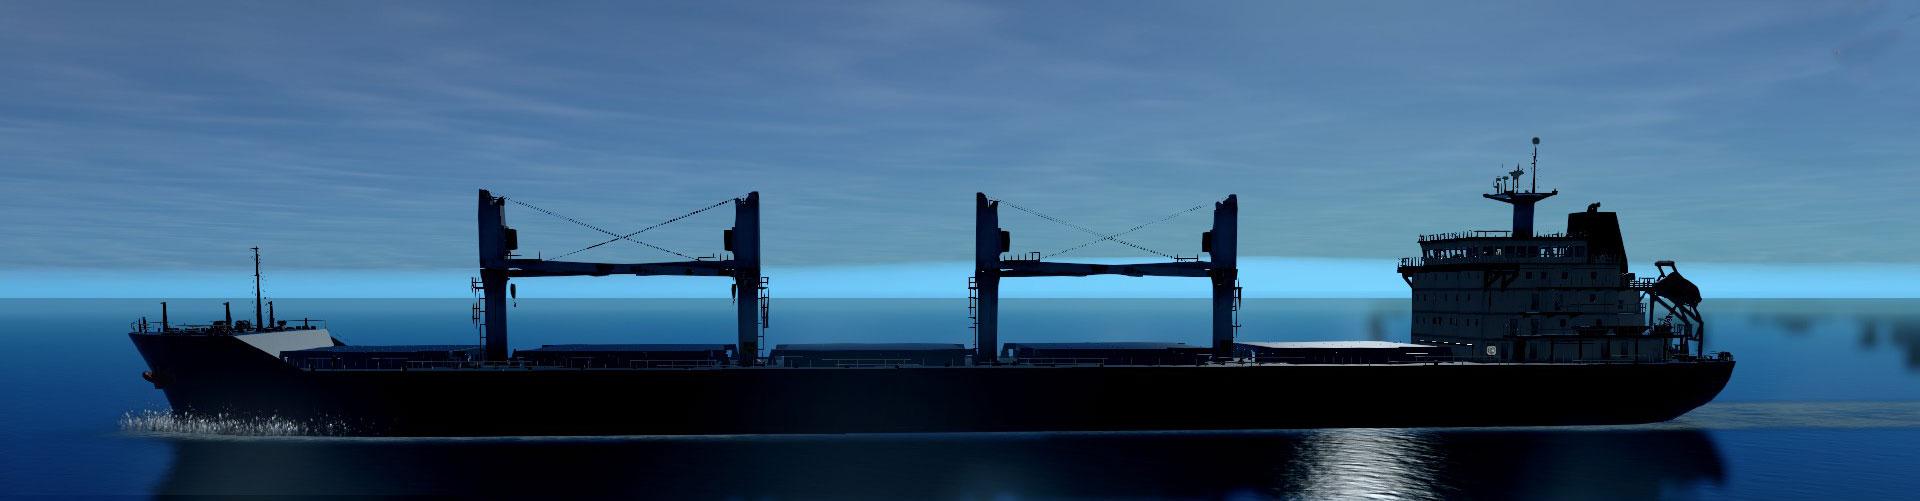 world-ship-simulator-9-subat-guncellemesi